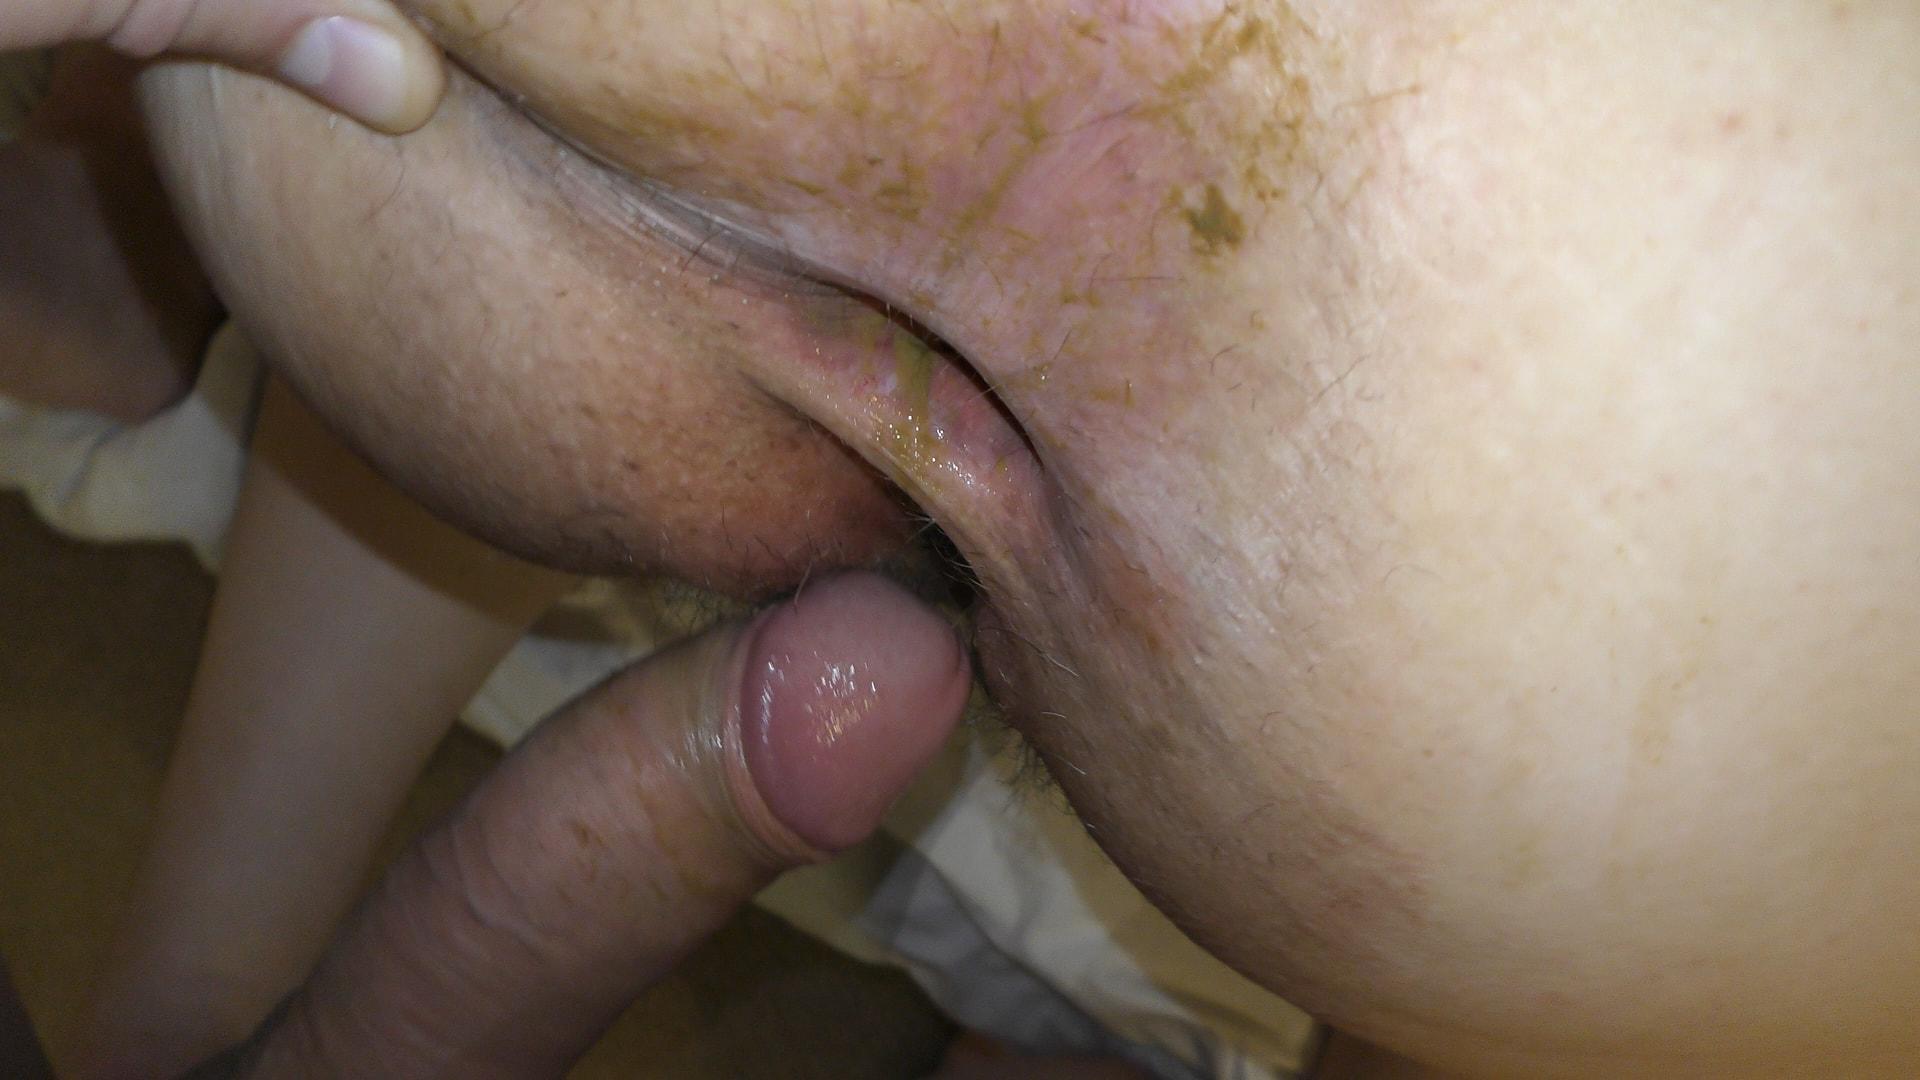 Latina close up anal toying